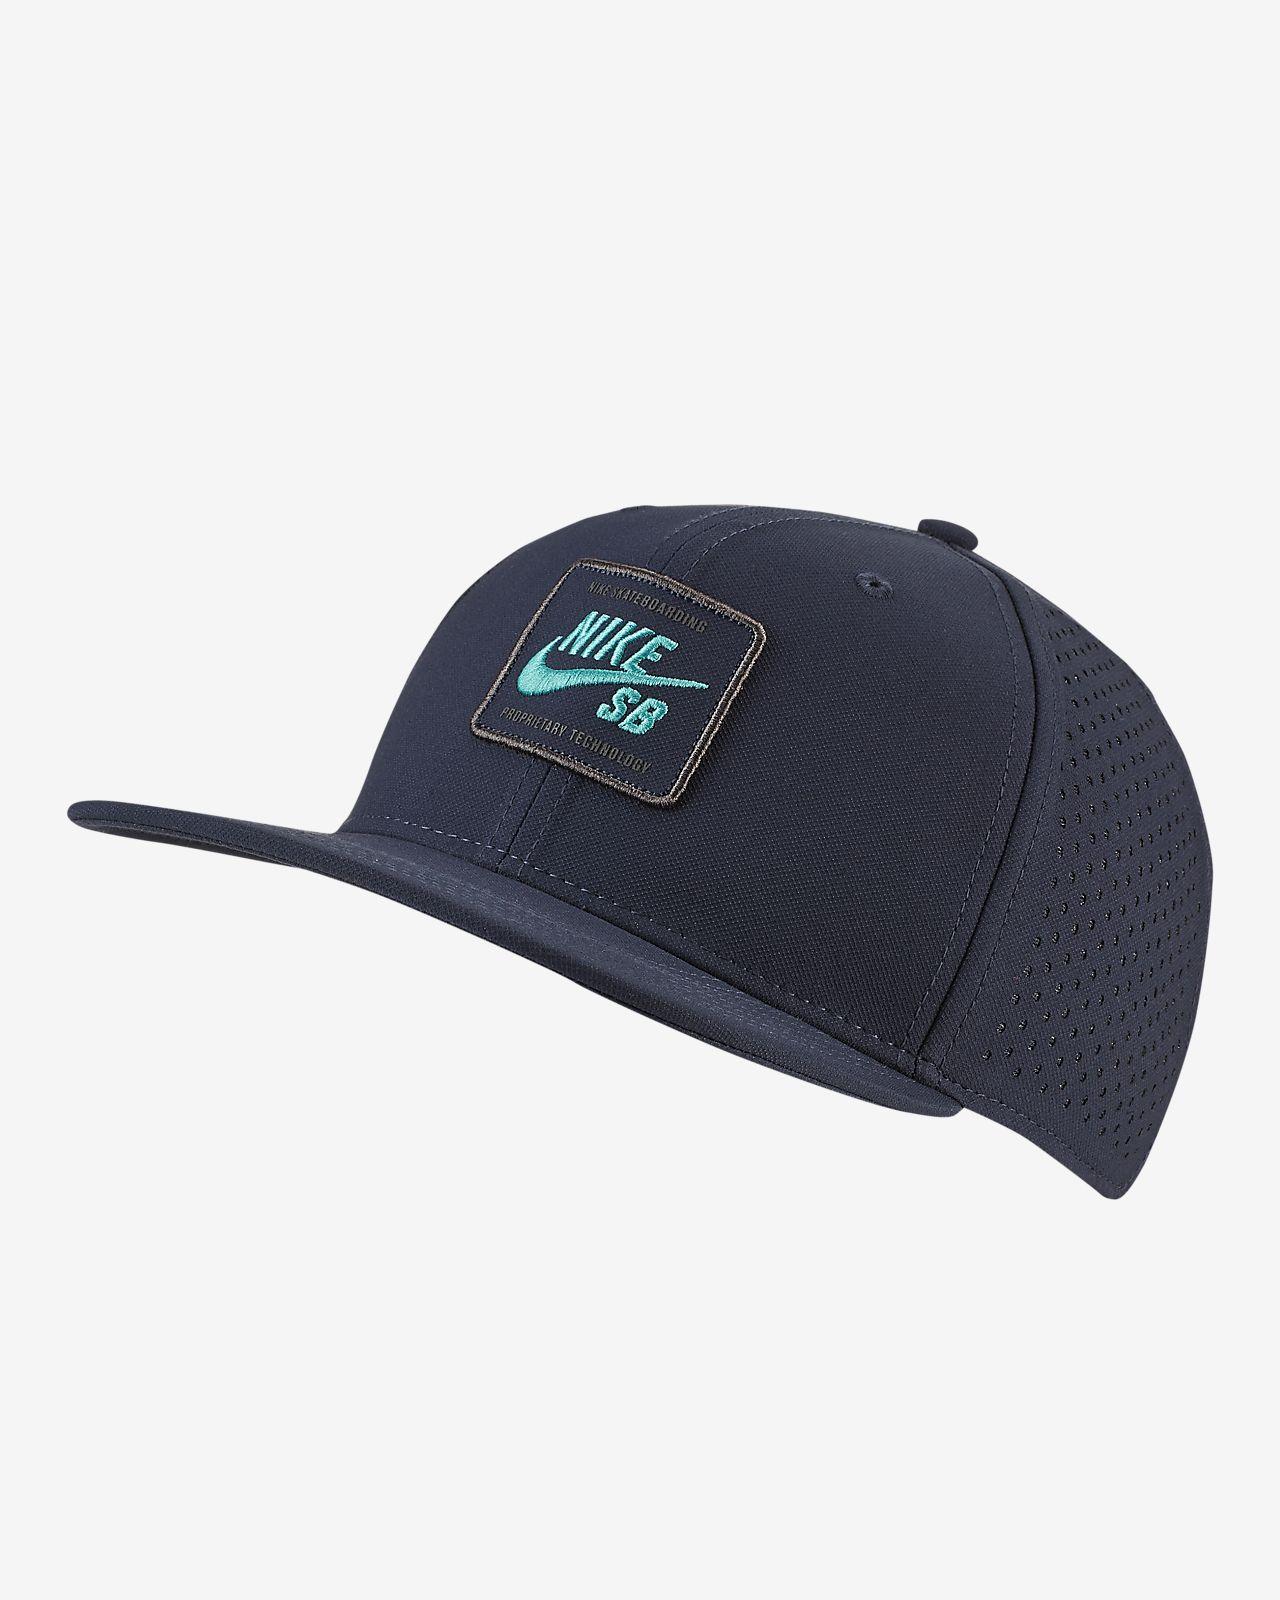 Nike SB AeroBill Pro 2.0 滑板帽